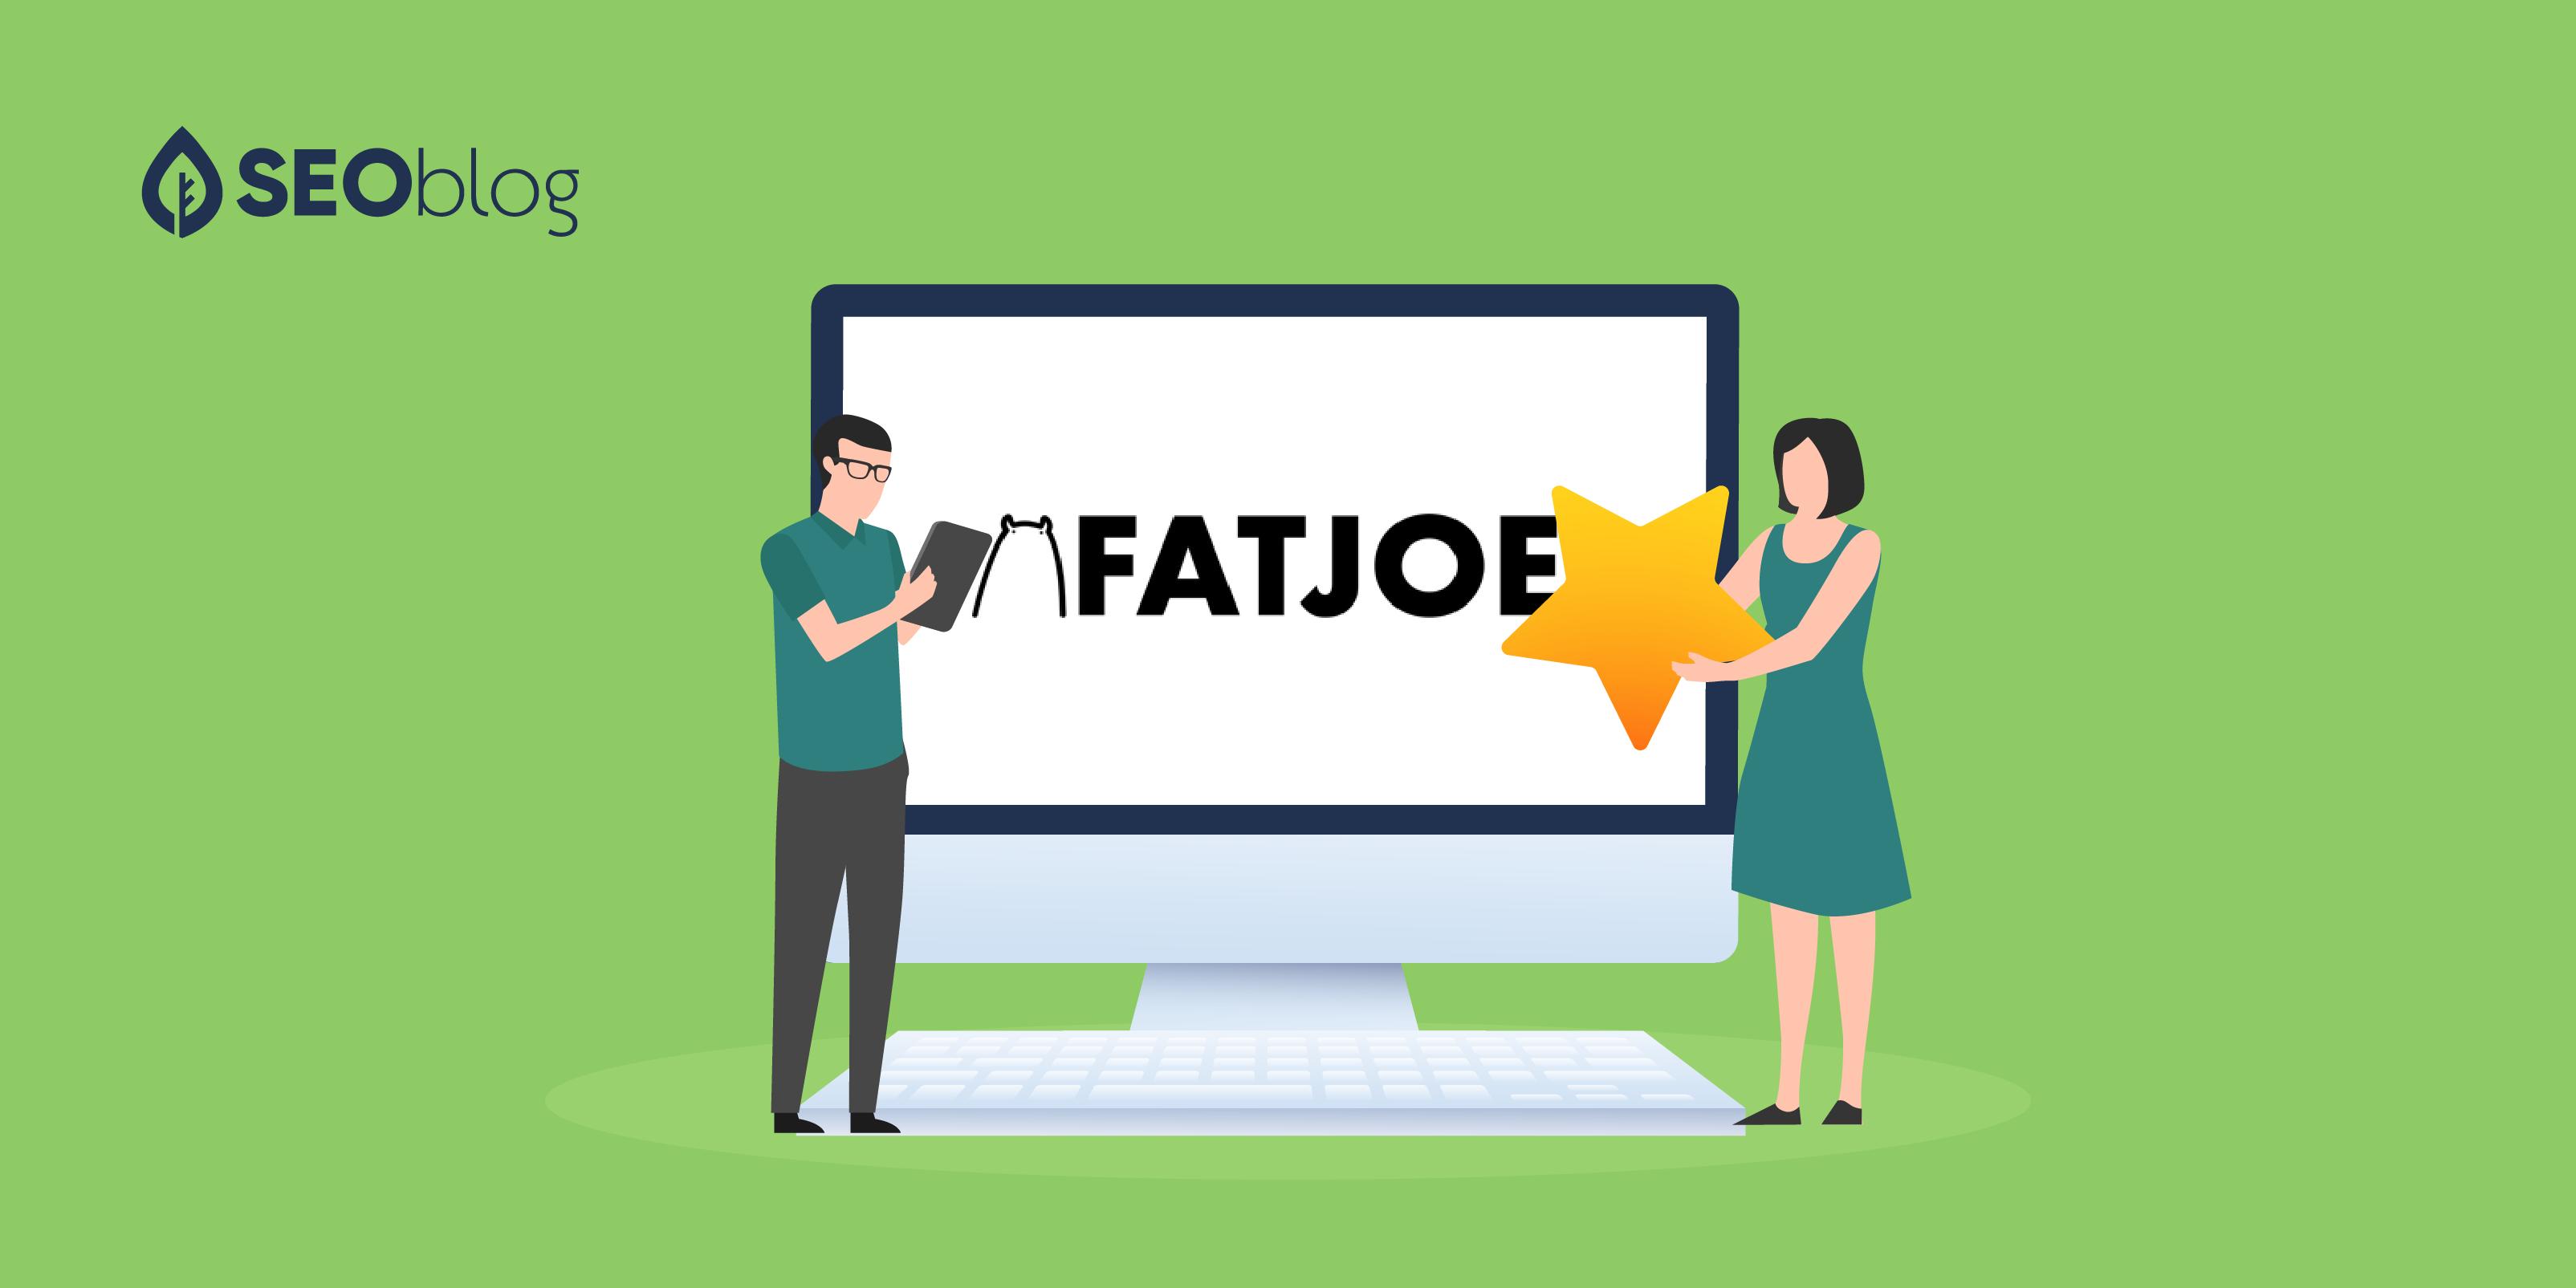 seoblog Review of FatJoe.co Outsourced Guest Blog Outreach